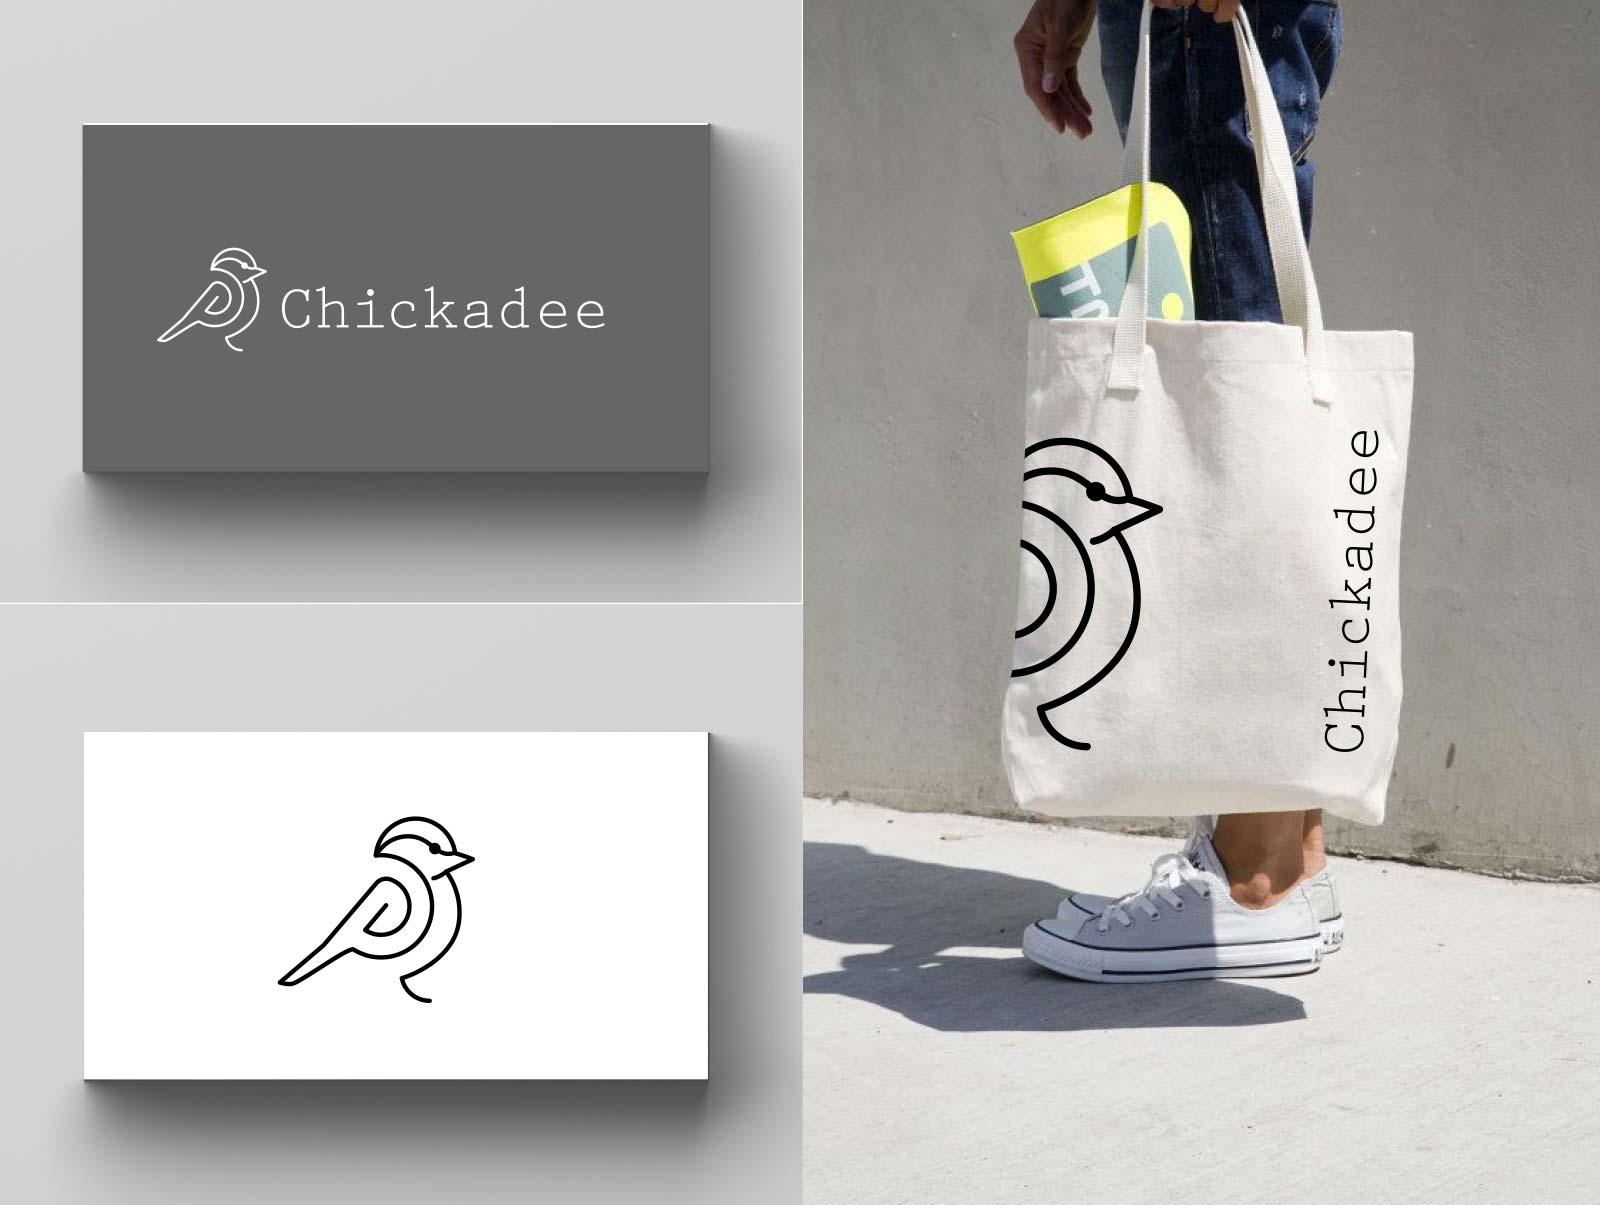 branding for chickadee